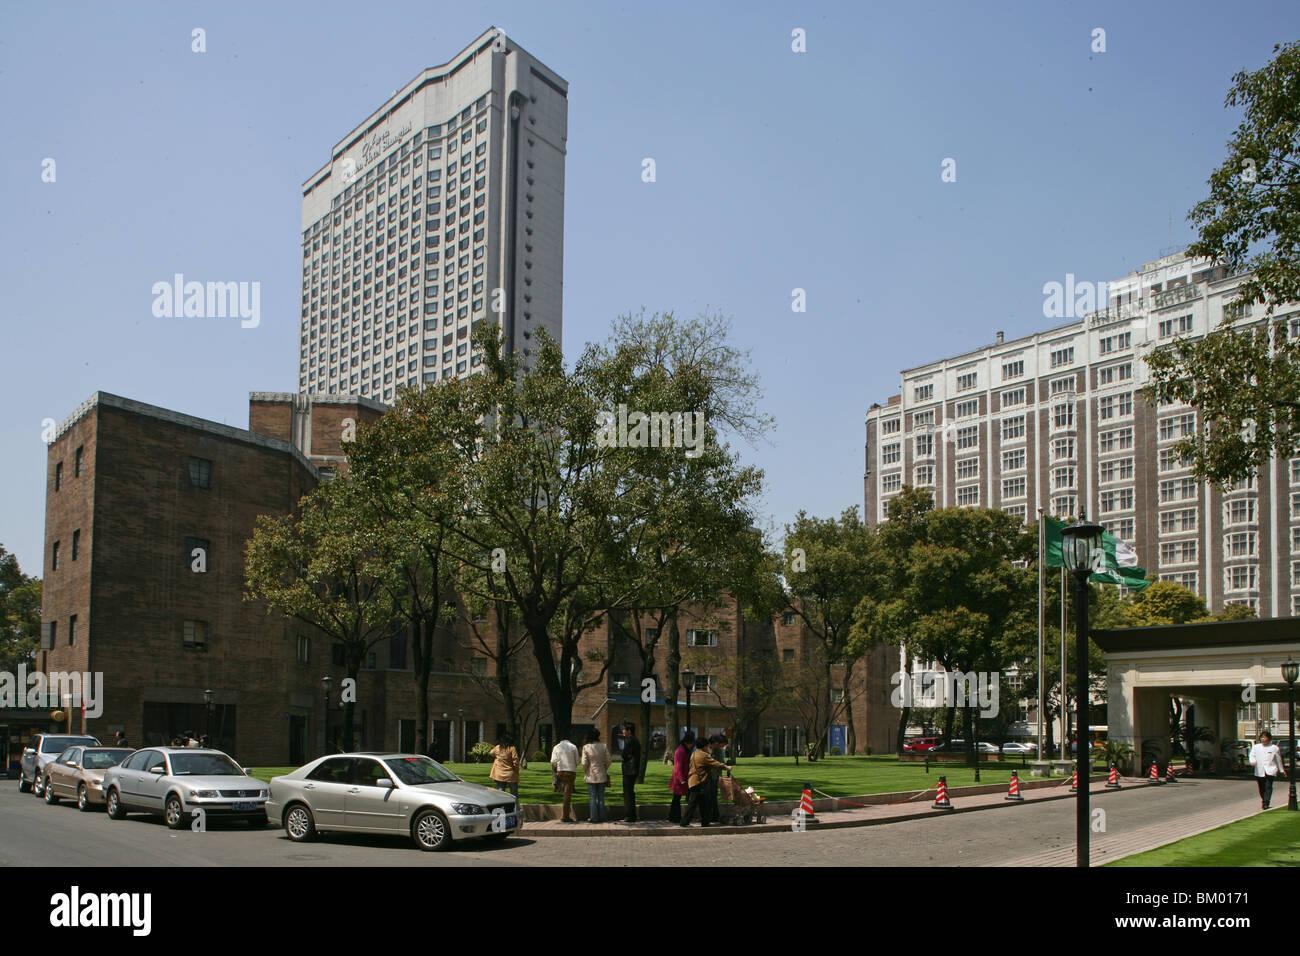 Jin Jiang Hotel And Okura Garden Hotel, Luxury Hotels   Stock Image